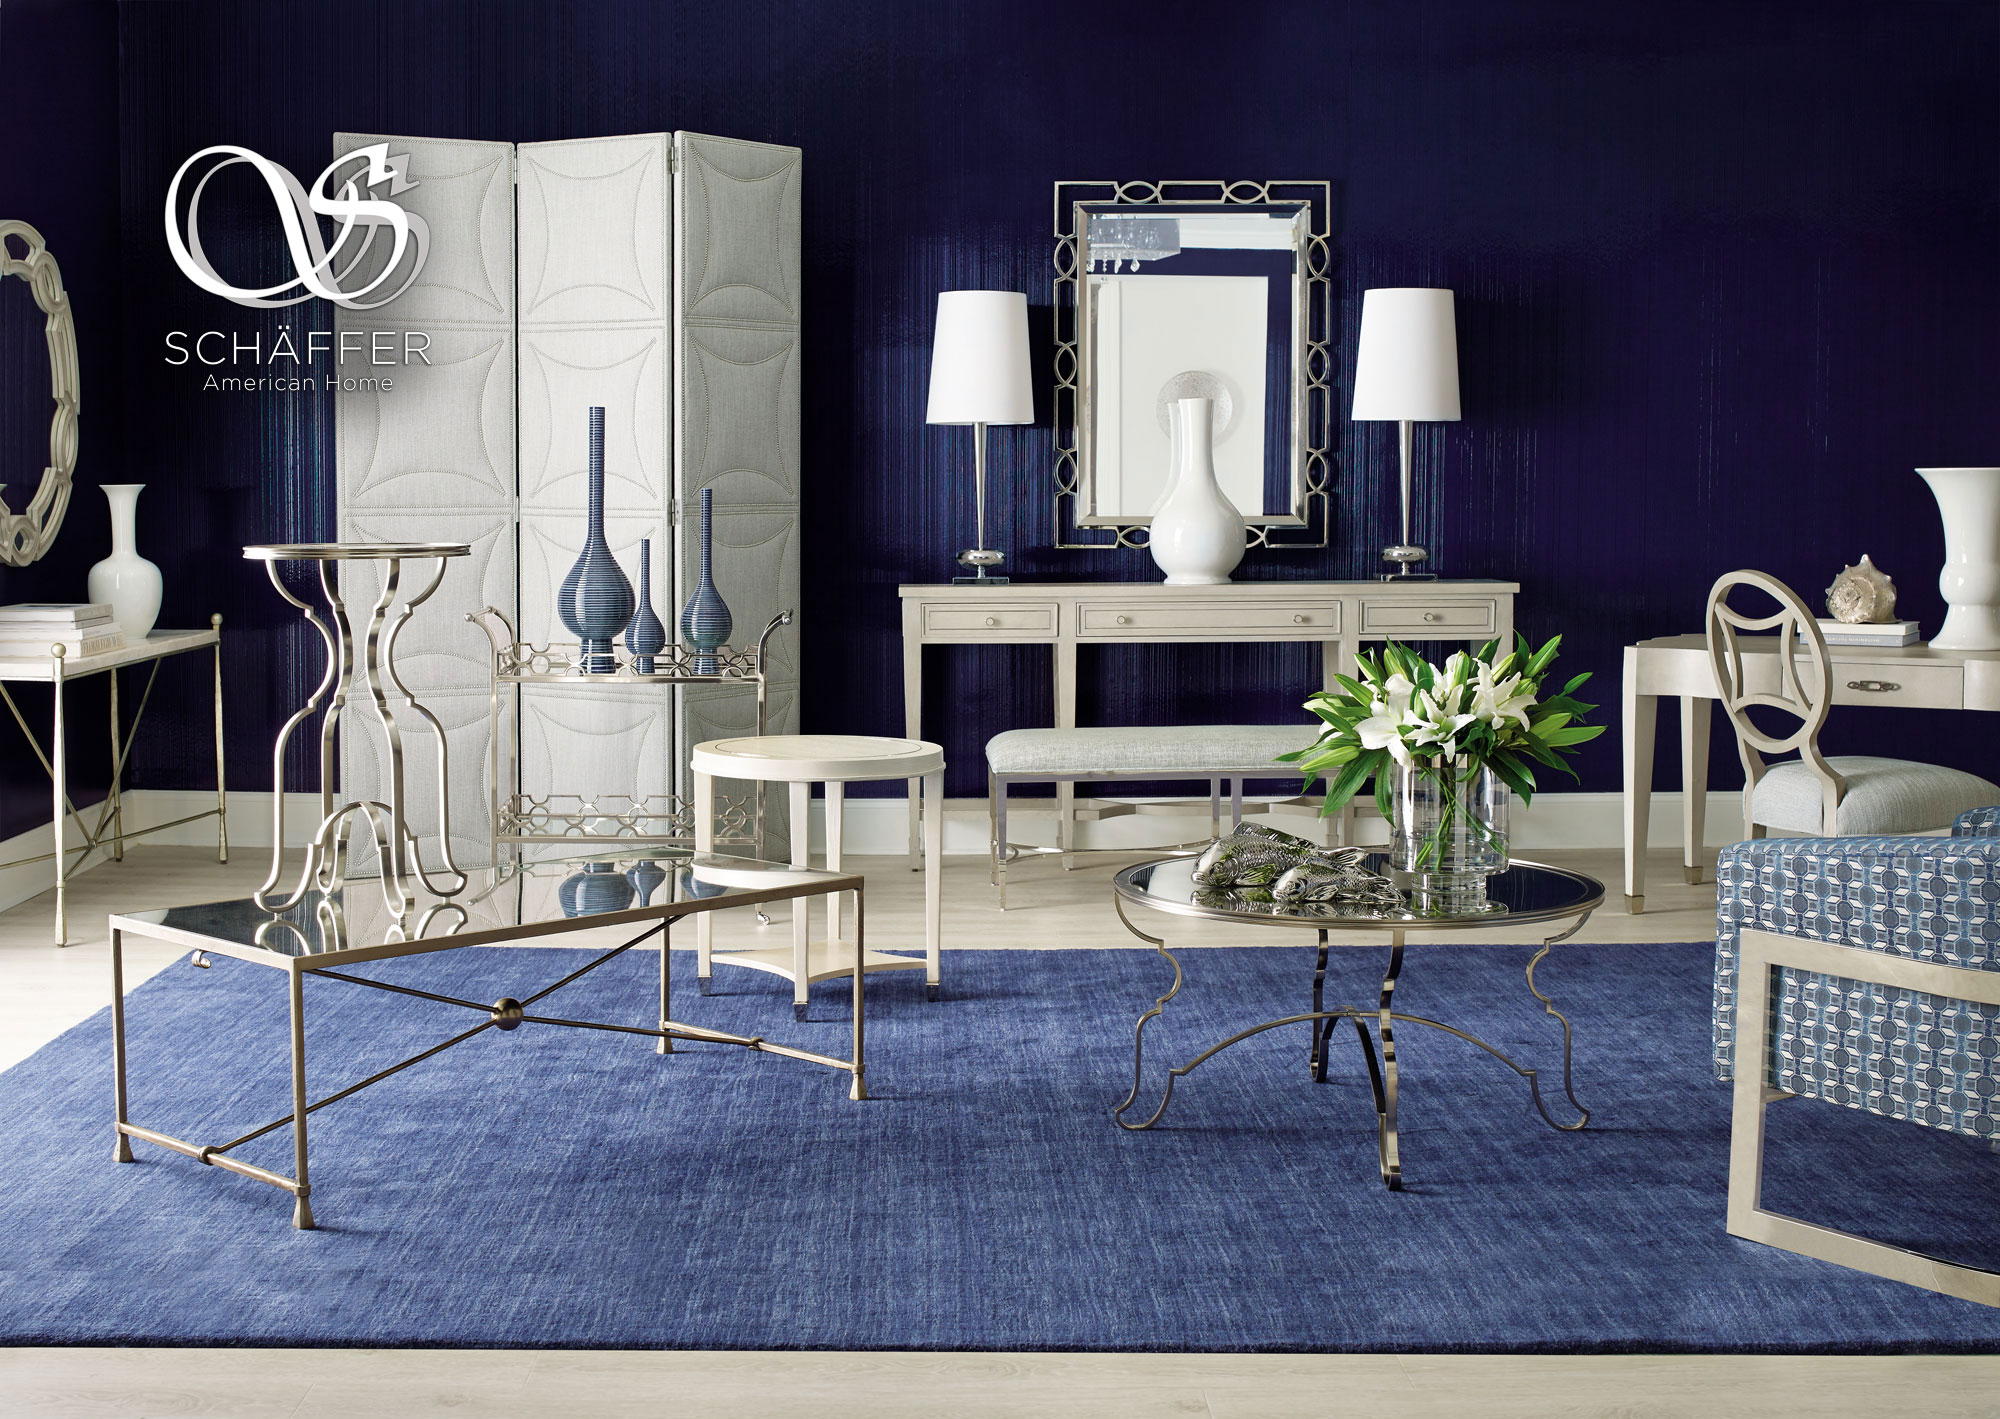 sch ffer american home. Black Bedroom Furniture Sets. Home Design Ideas